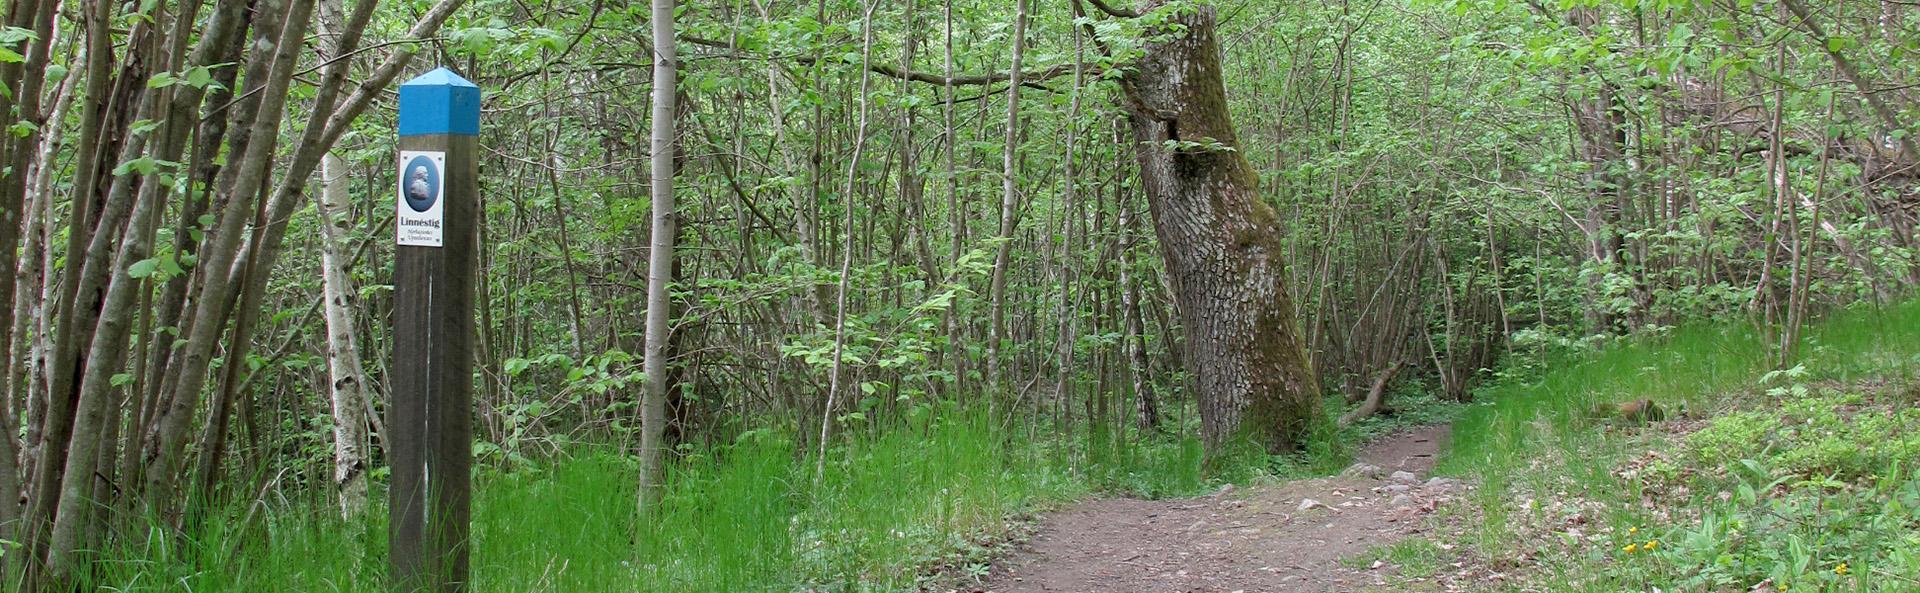 Lövskog på våren. Foto: Bioresurs